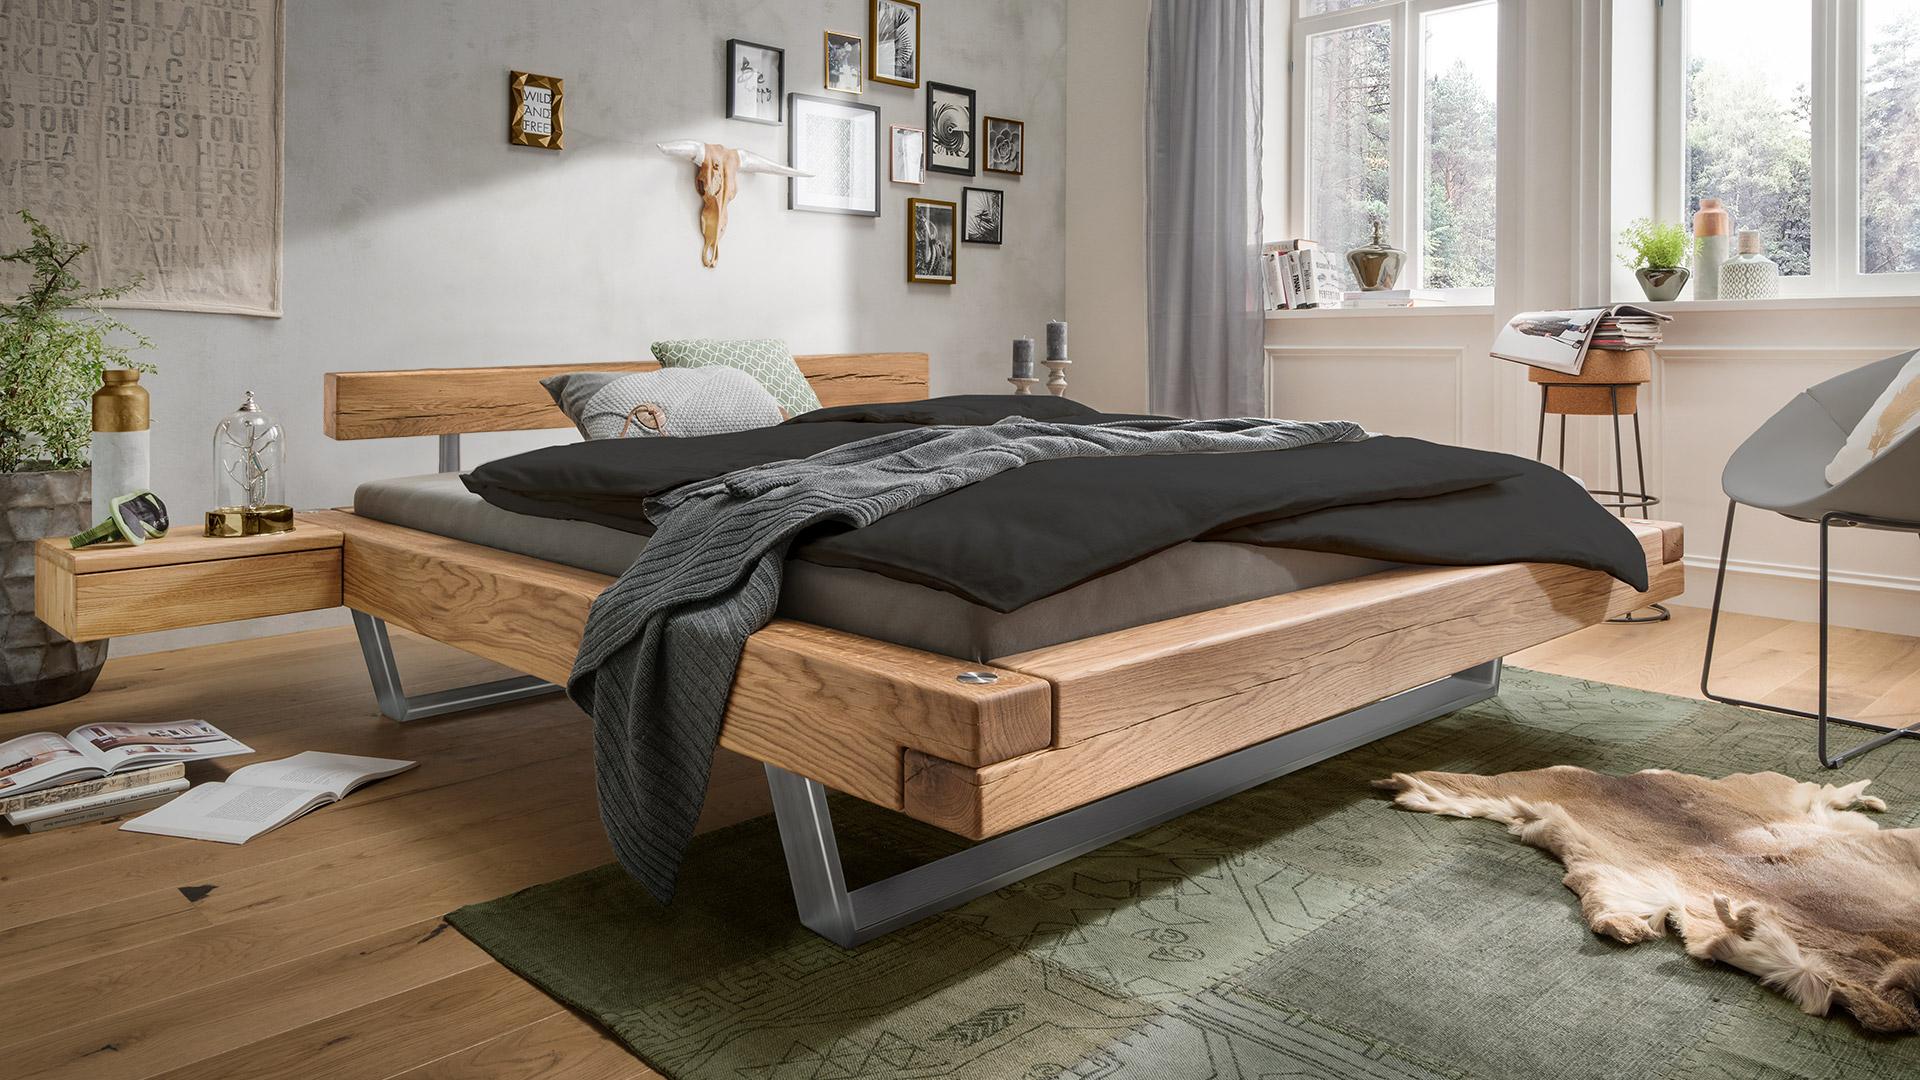 schwebebett madea massive eiche. Black Bedroom Furniture Sets. Home Design Ideas